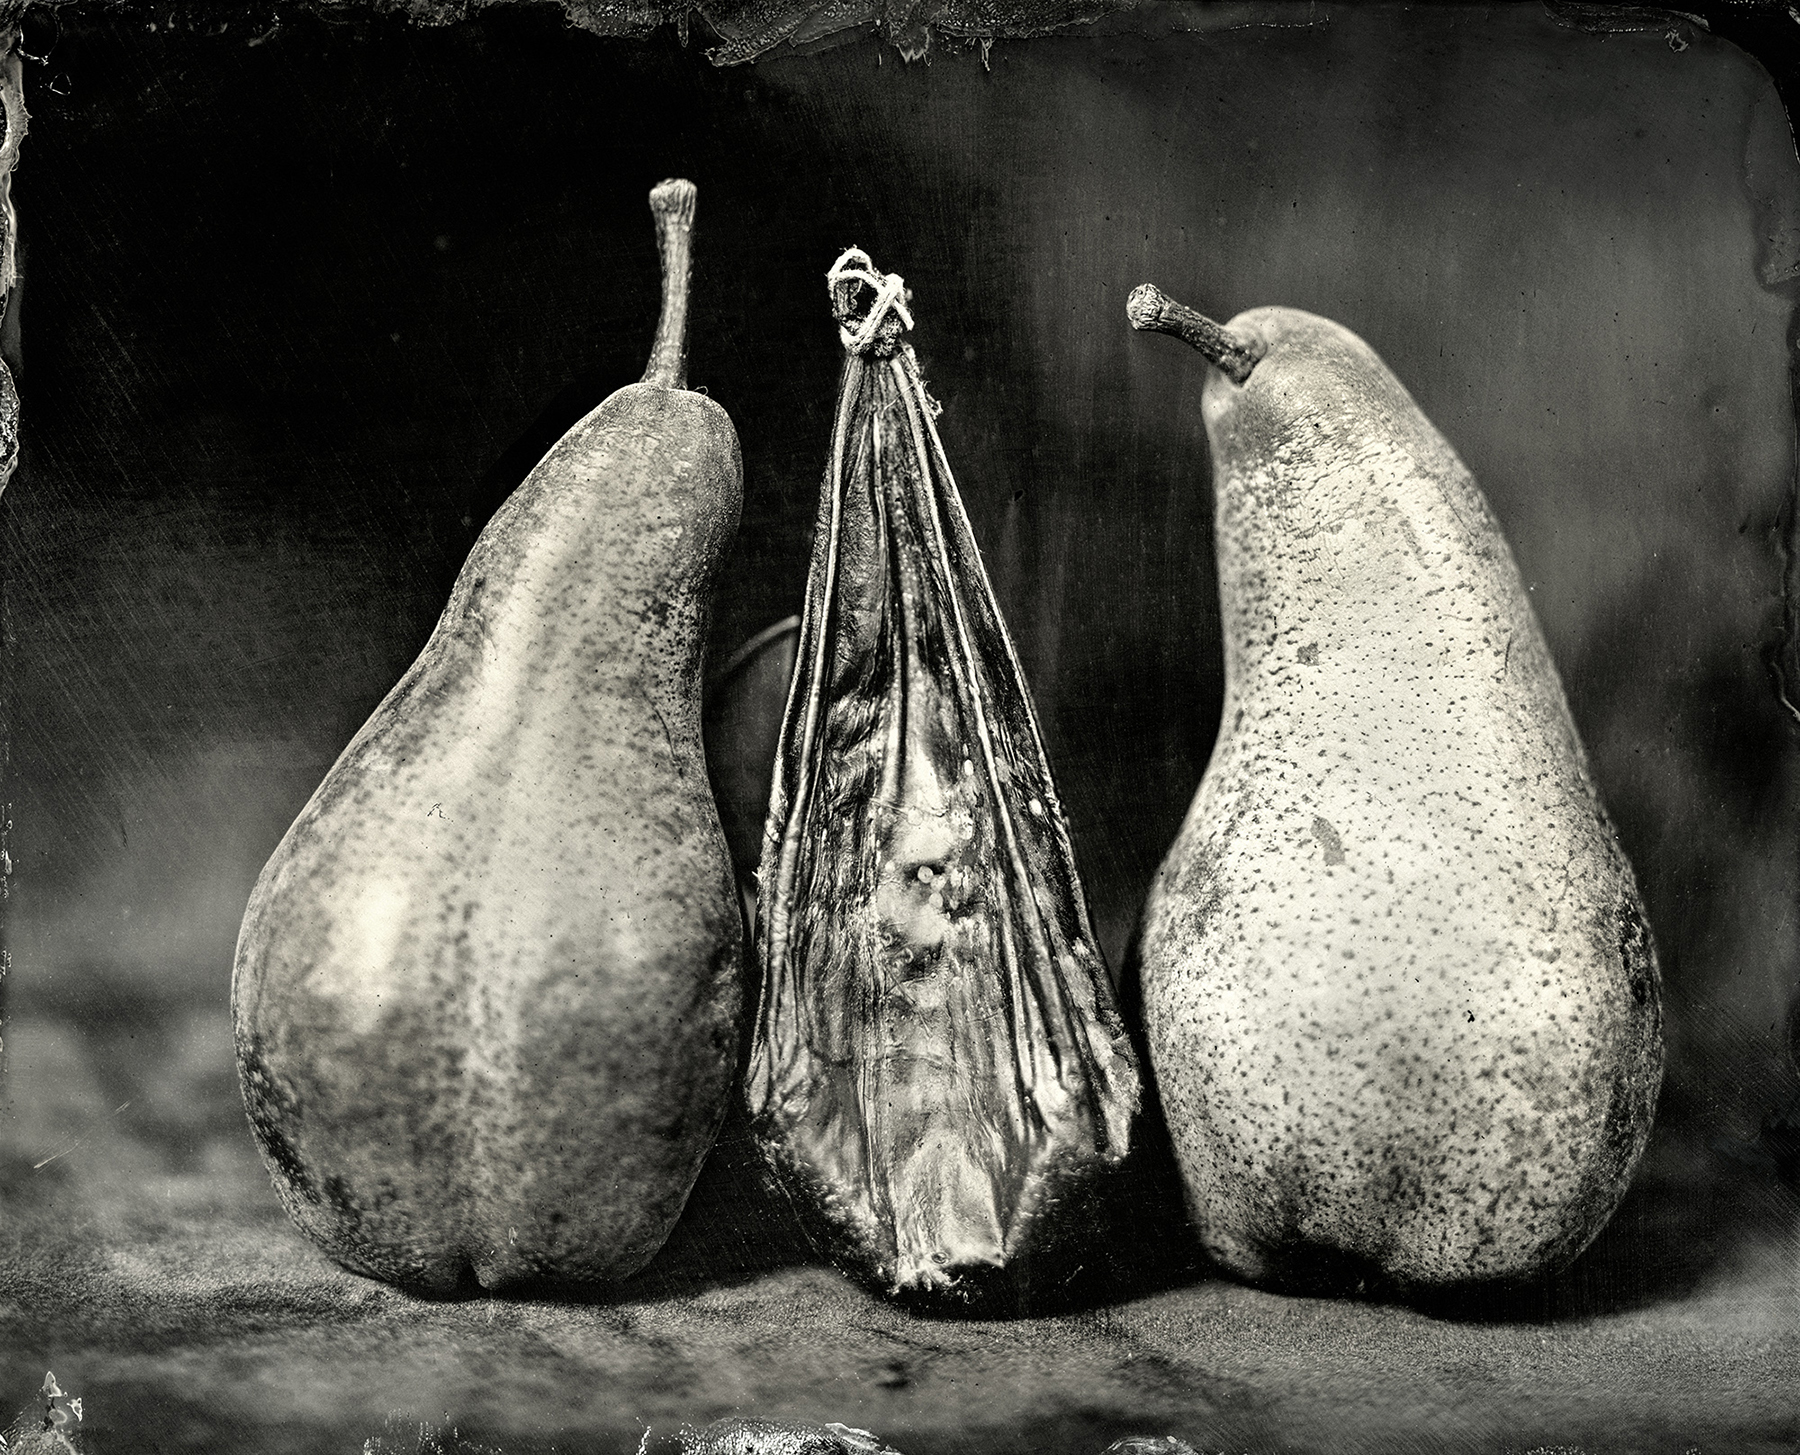 Christine_Fitzgerald_TRAFFICKED_Bear Gallbladder with Bosc Pears_01.jpg